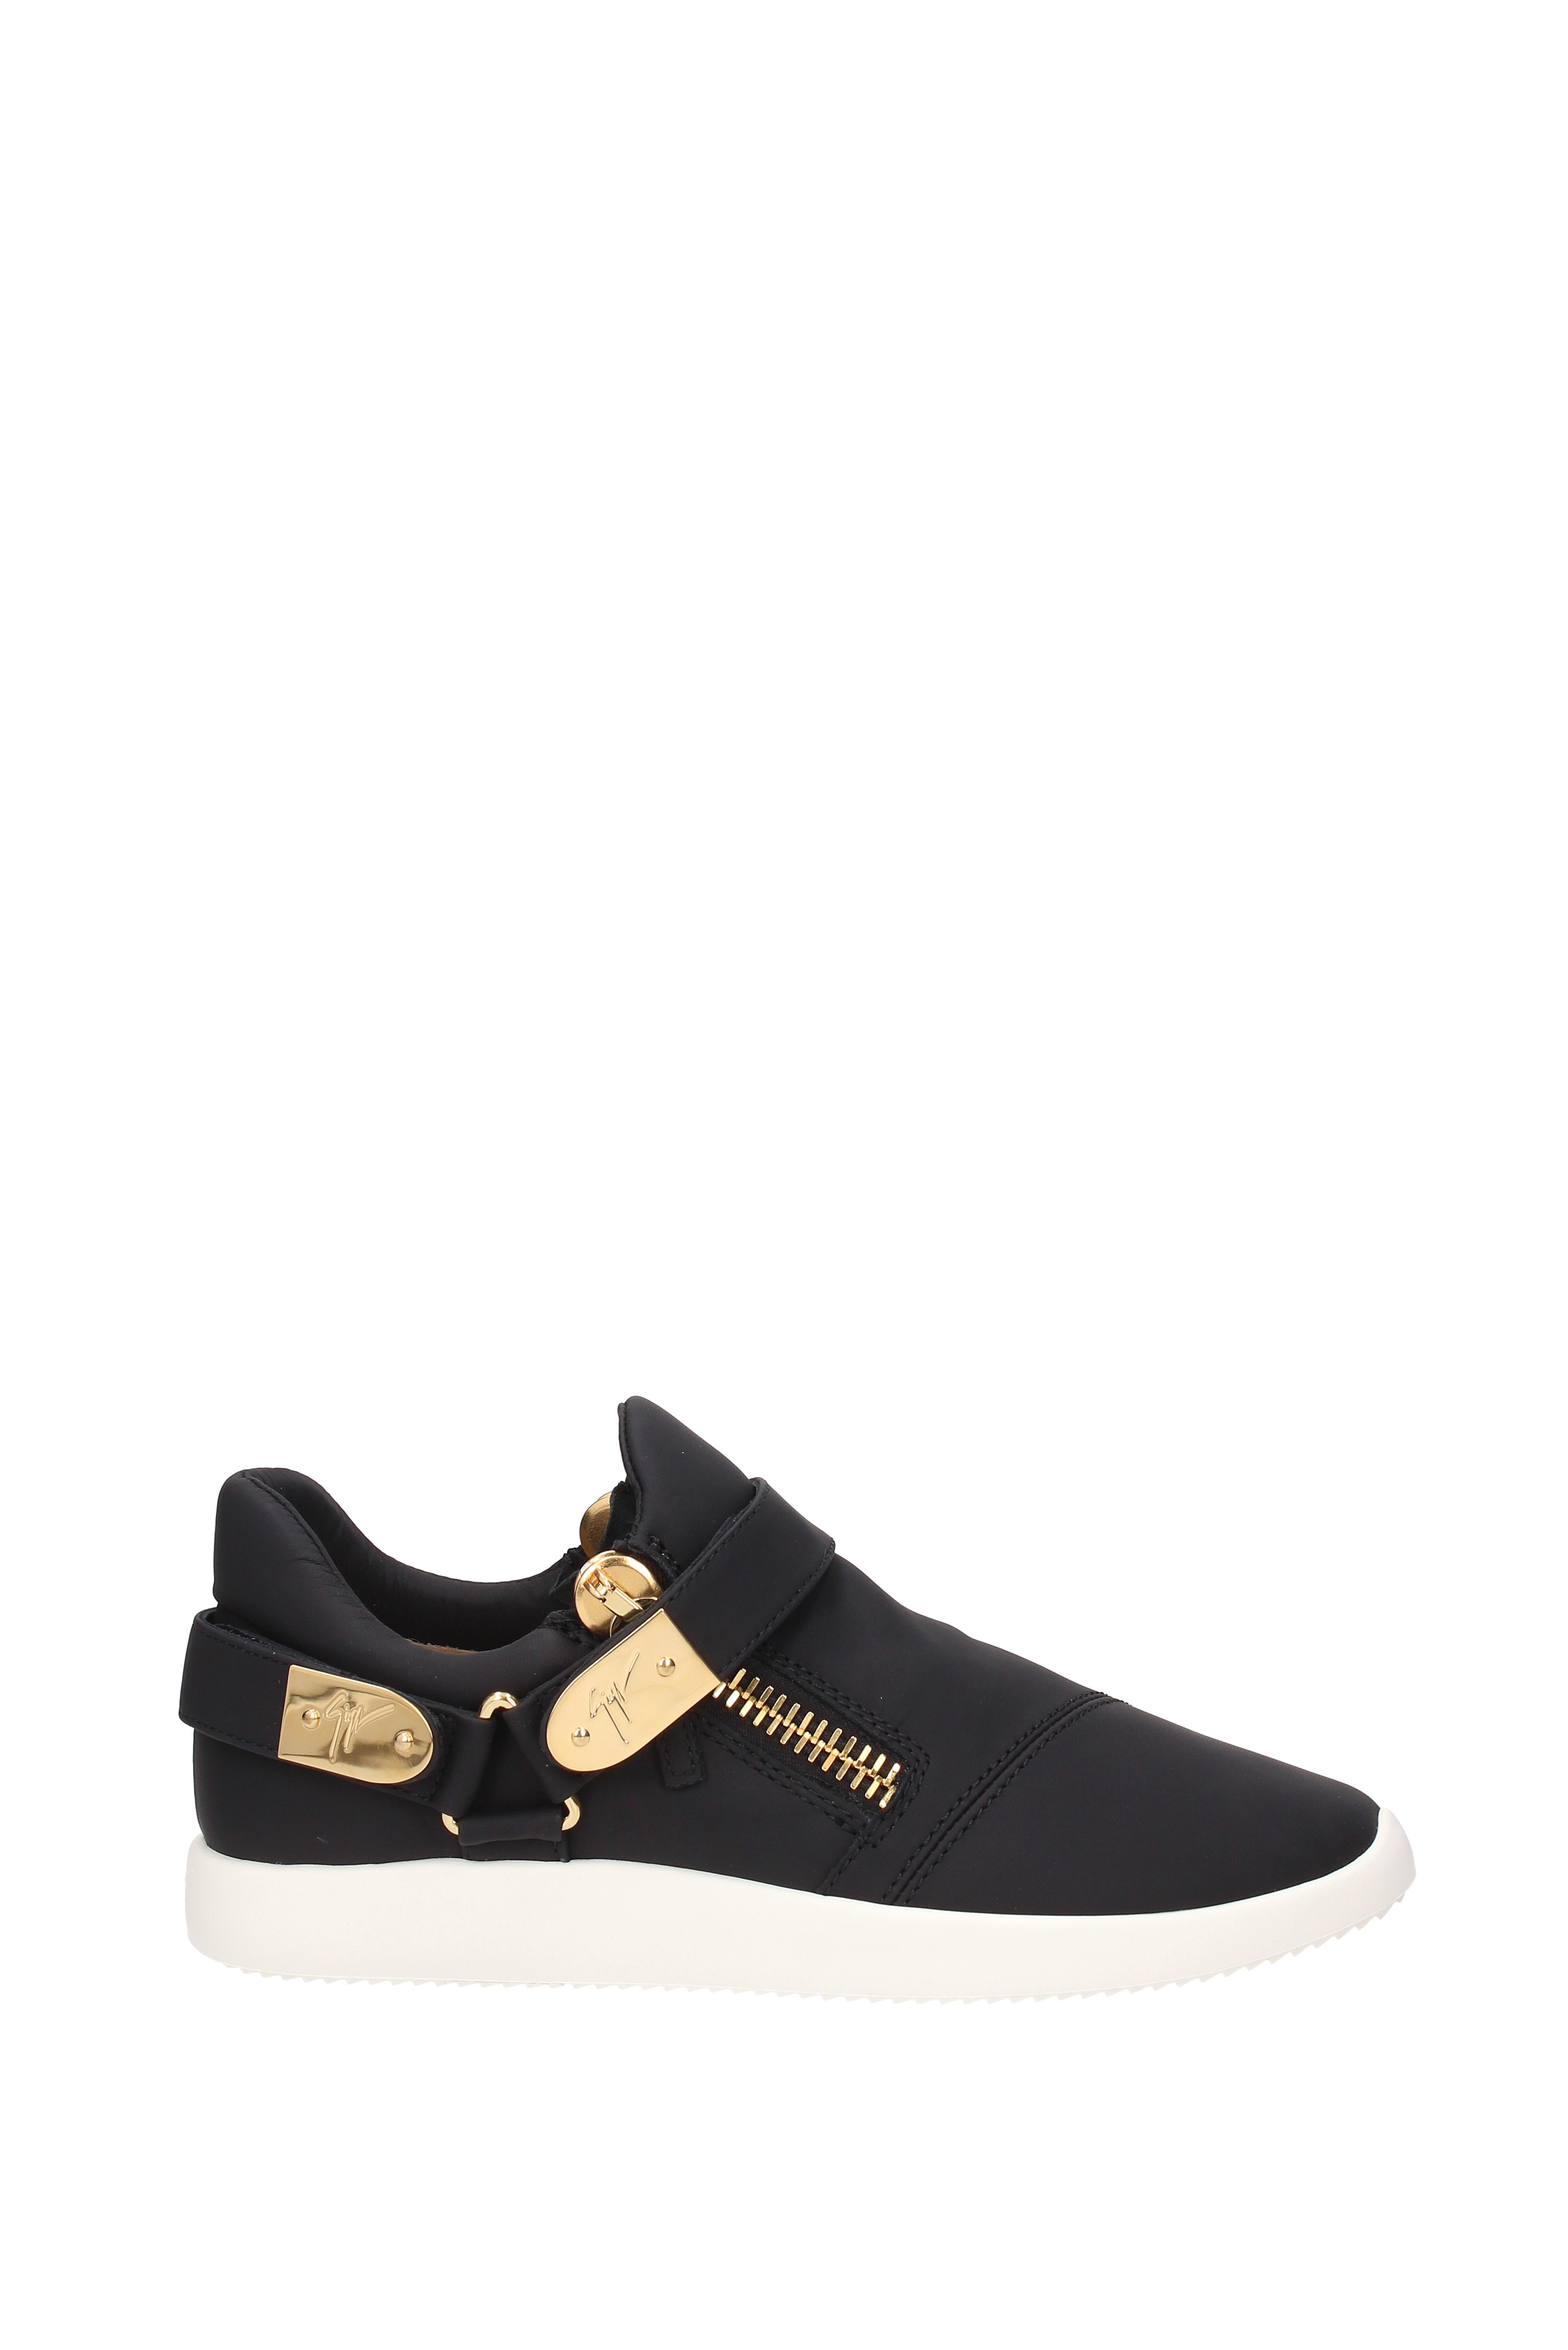 Sneakers Giuseppe Zanotti singleg Uomo - Pelle (RM7144SINGLEG)